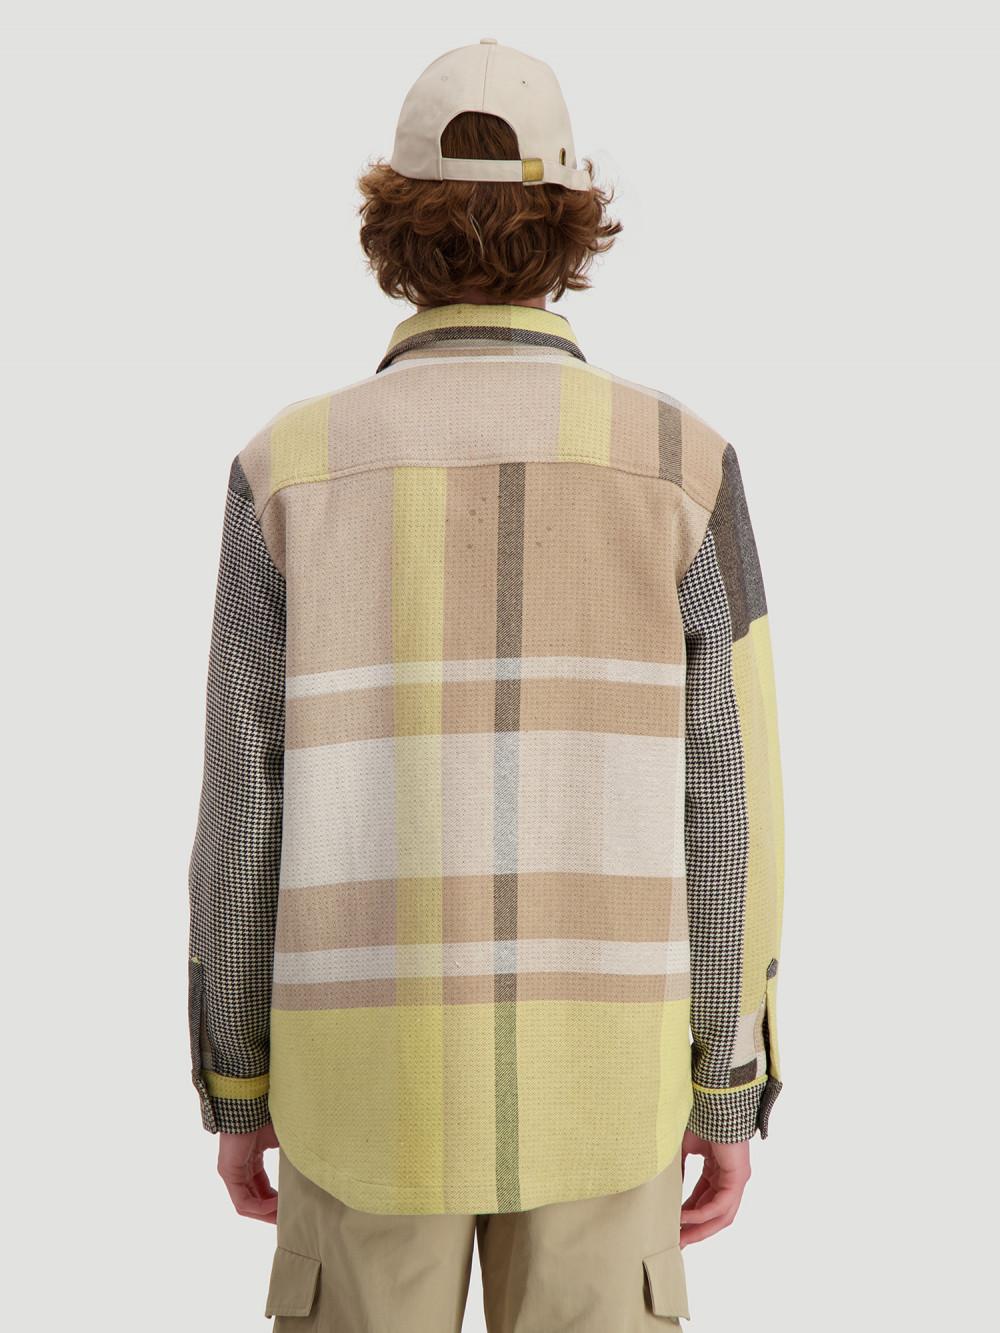 Elix Shirtjacket Yellow Check